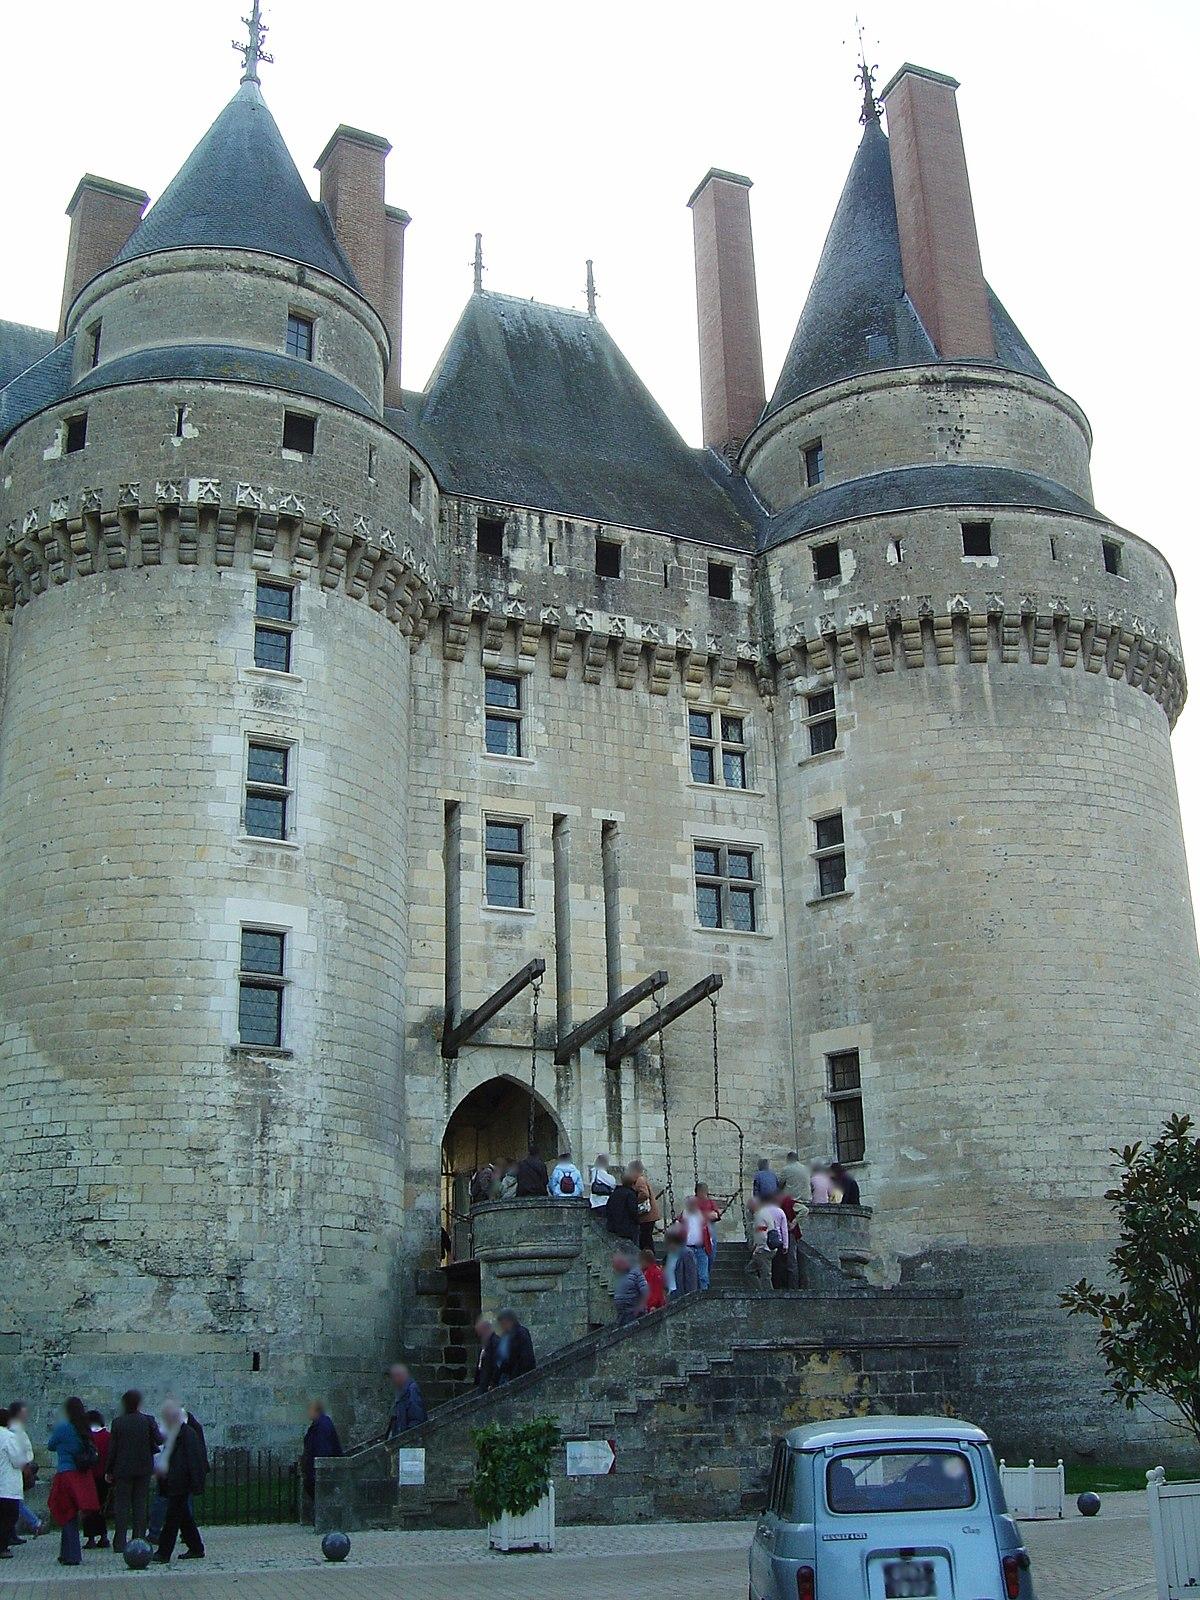 Px Chateau Langeais